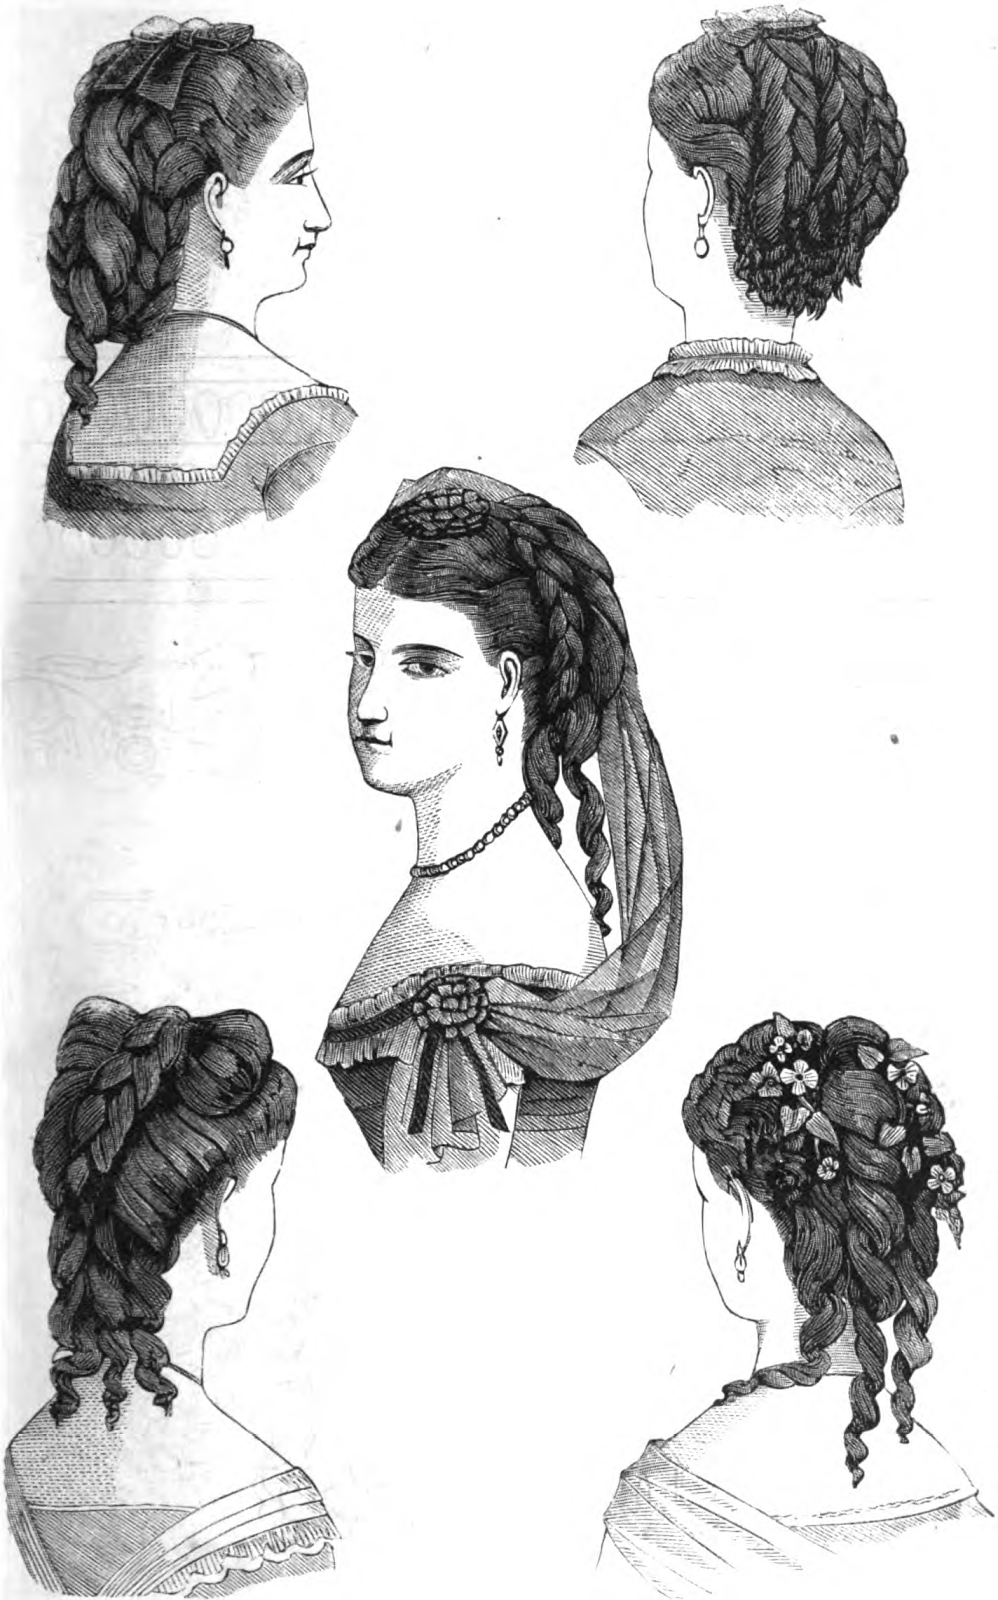 19th Century Historical Tidbits 1870 Hair Fashions 1870s Clothing